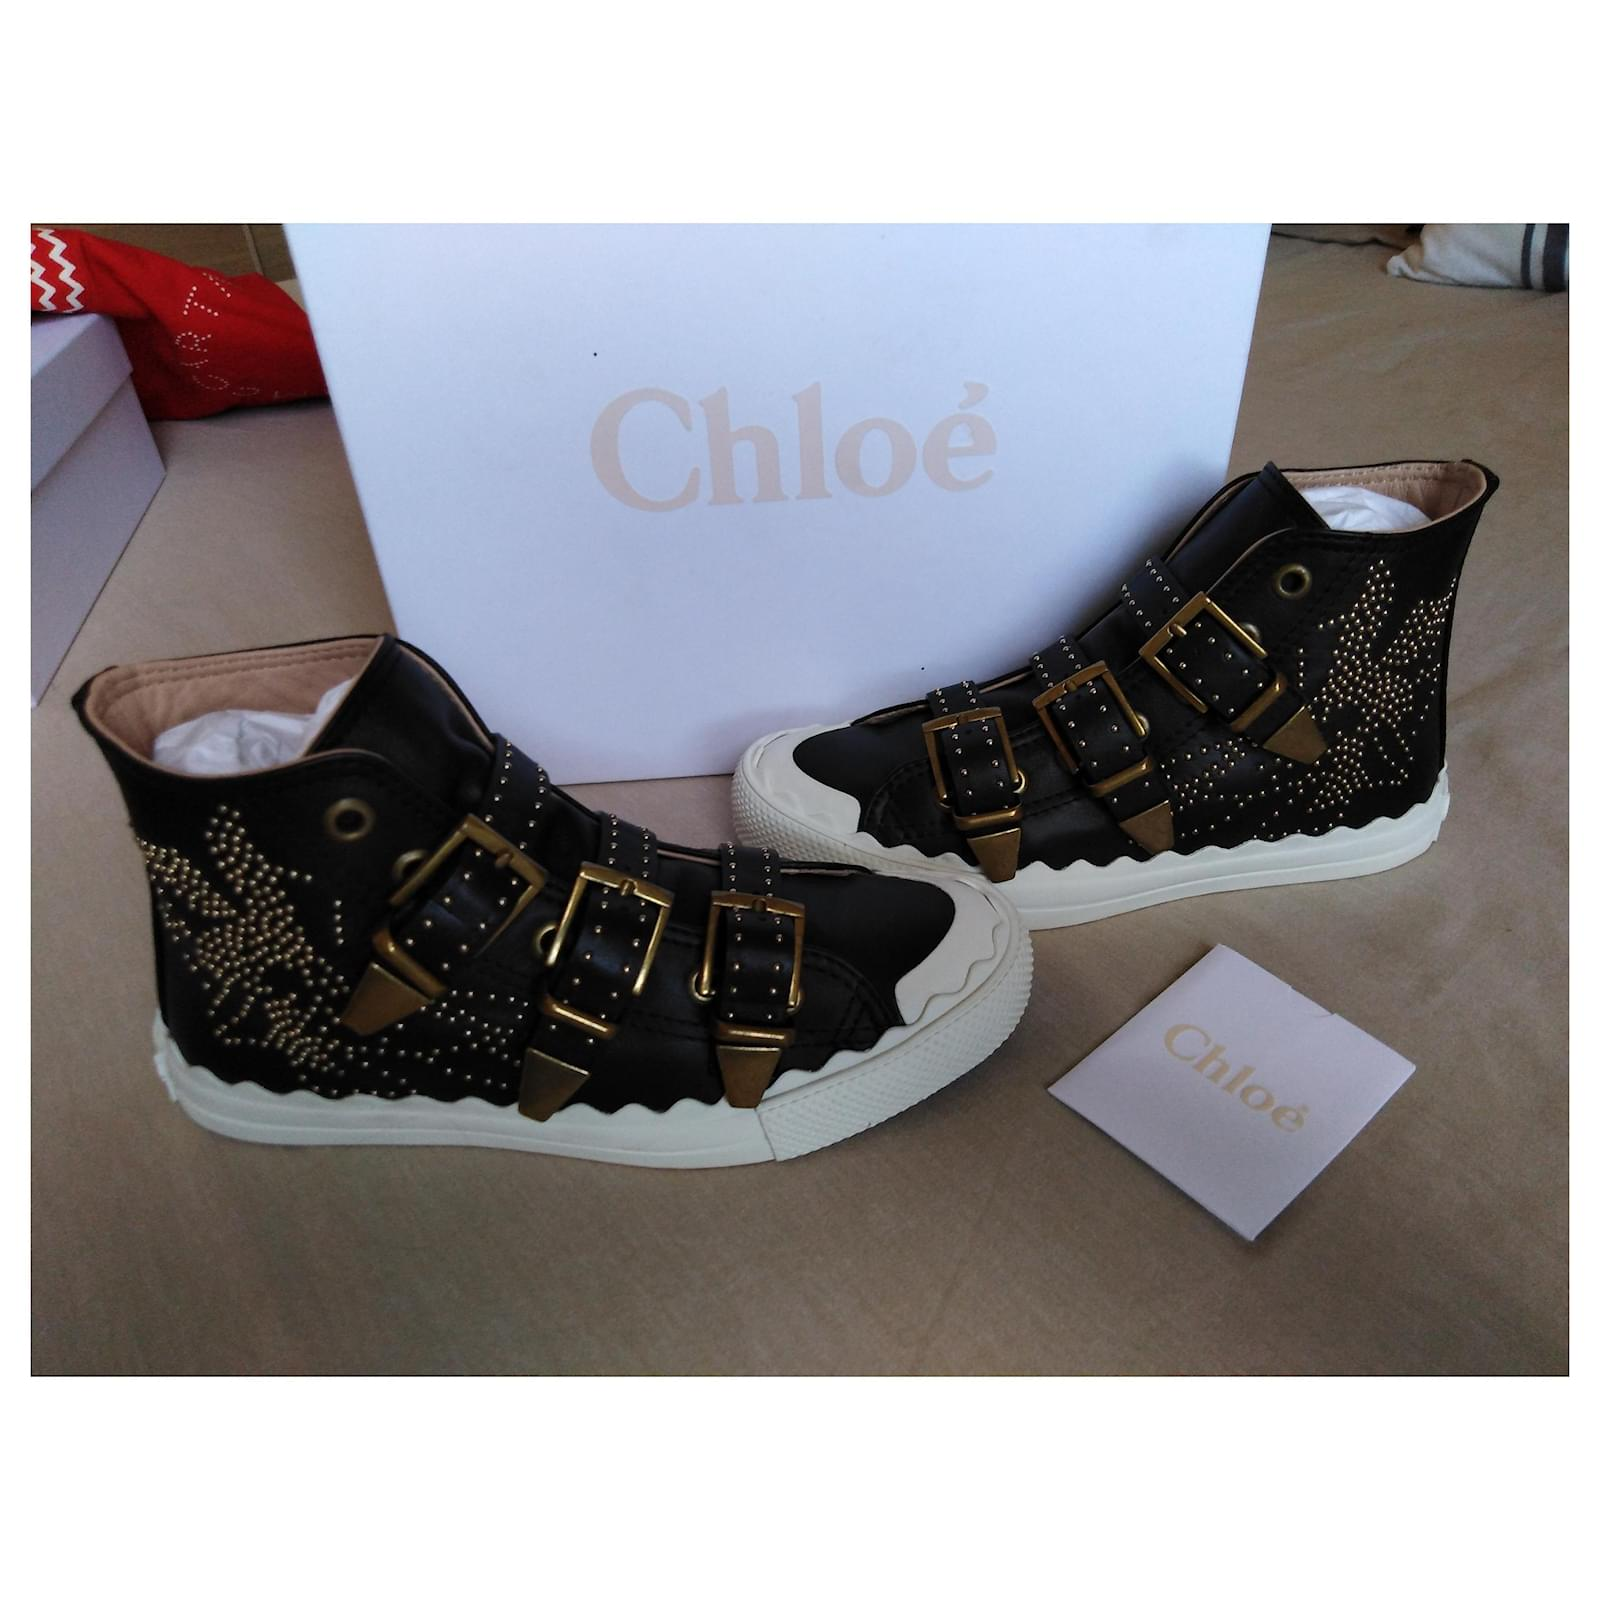 Chloé Susanna Sneakers Leather Black